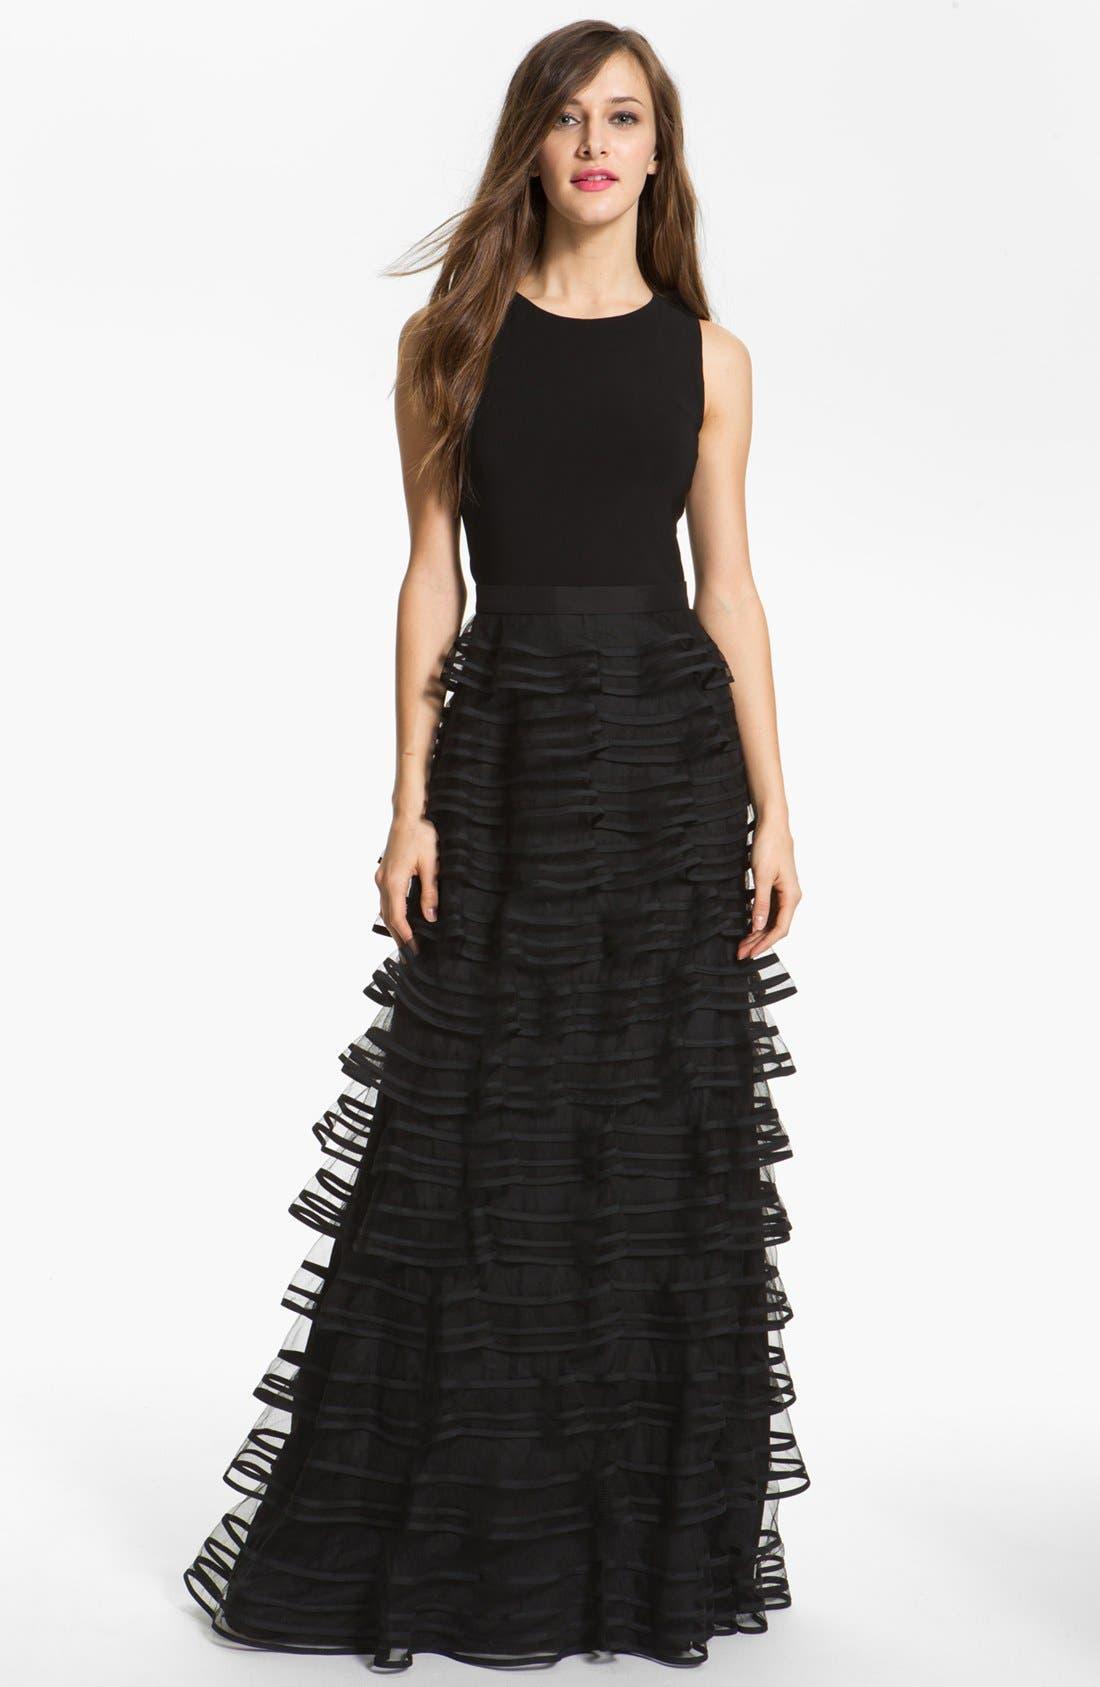 Main Image - Kathy Hilton Sleeveless Tiered Mesh Dress